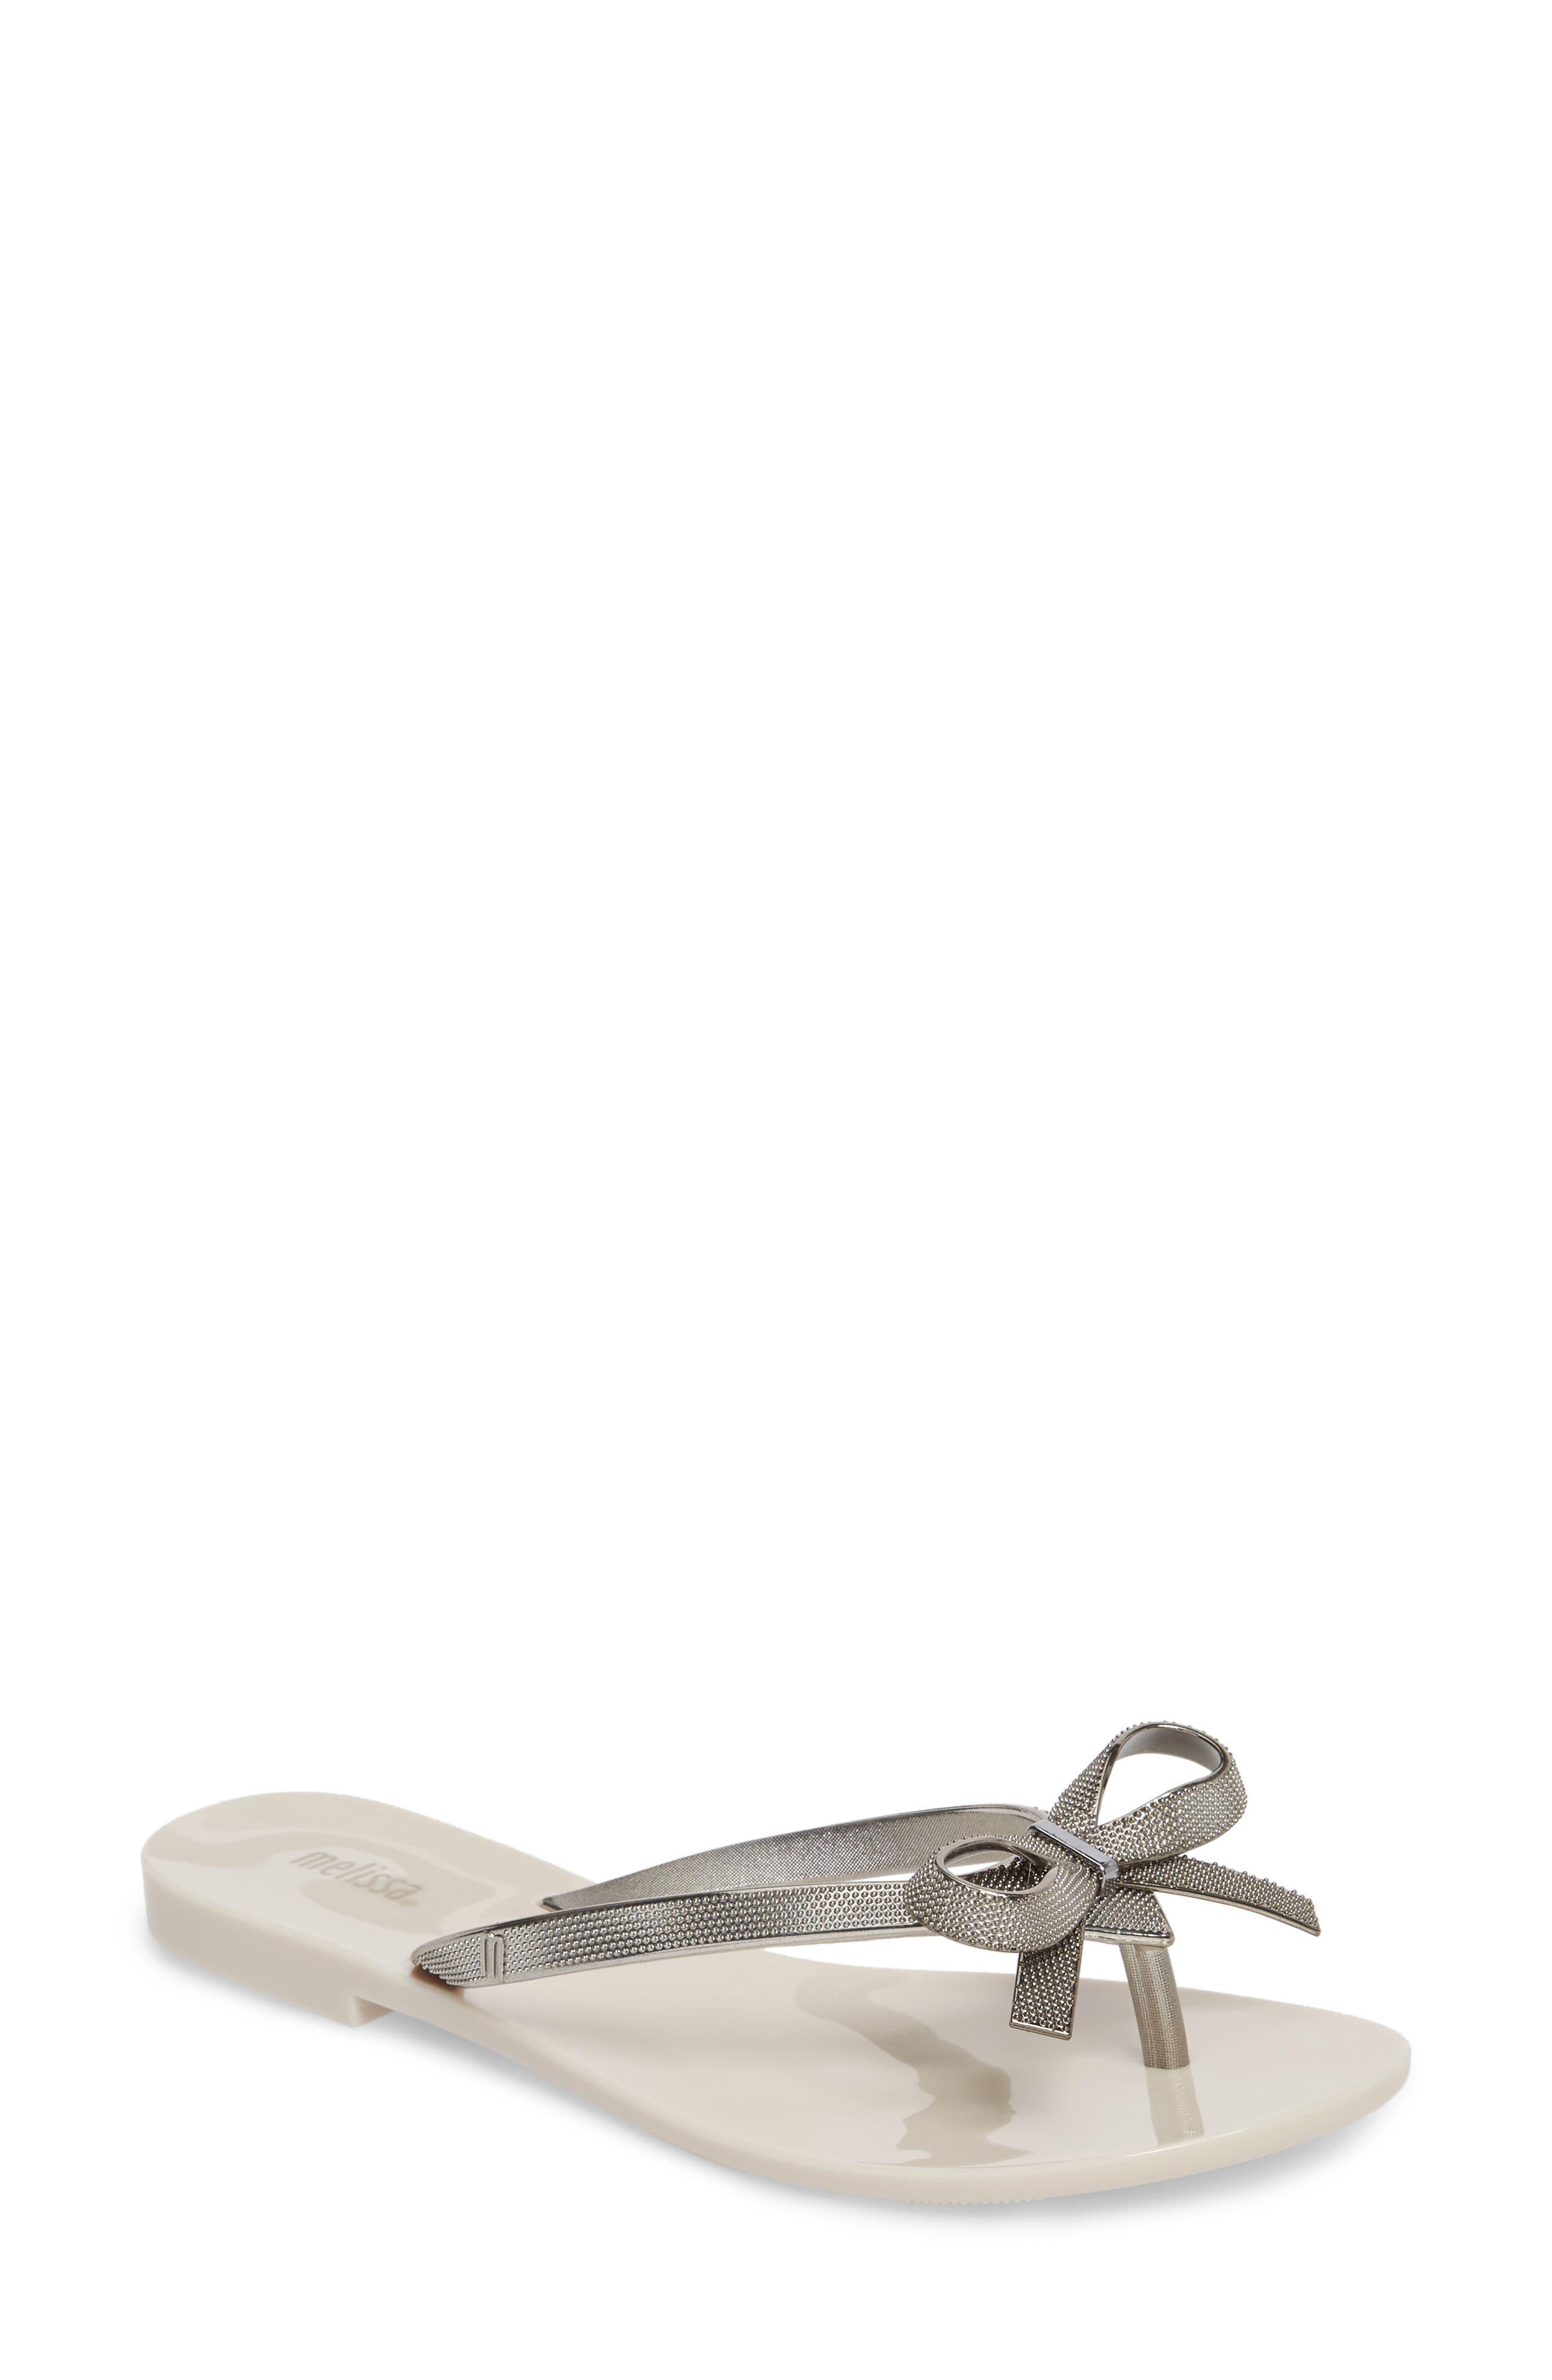 Harmonic Bow Chrome II Sandal,                             Main thumbnail 1, color,                             040